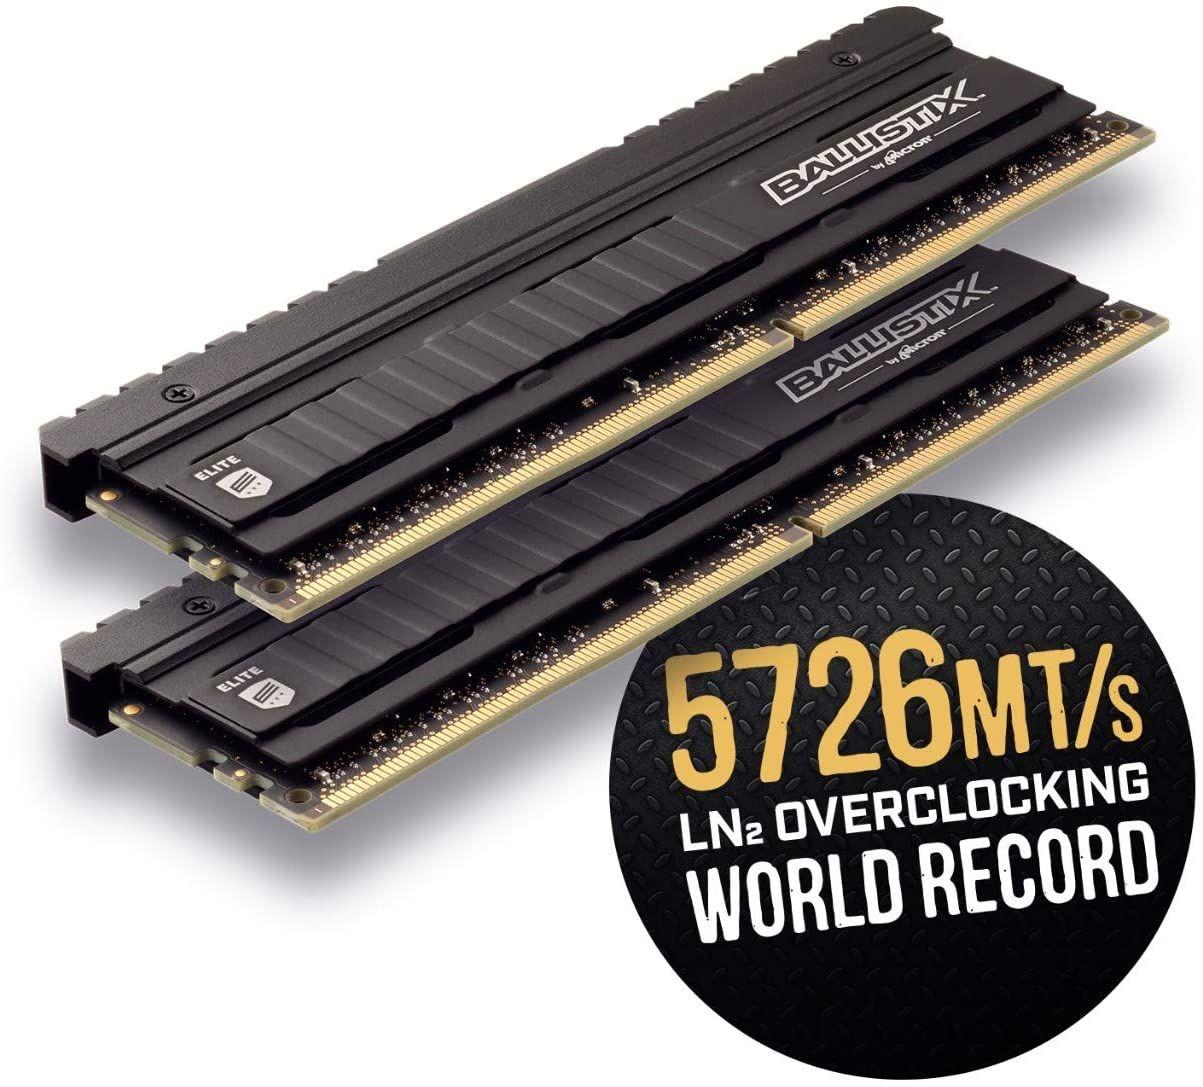 Crucial Ballistix Elite BLE2K8G4D36BEEAK 16GB (8GBx2) Desktop Gaming Speicher Kit (3600 MHz, DDR4, DRAM, CL16)